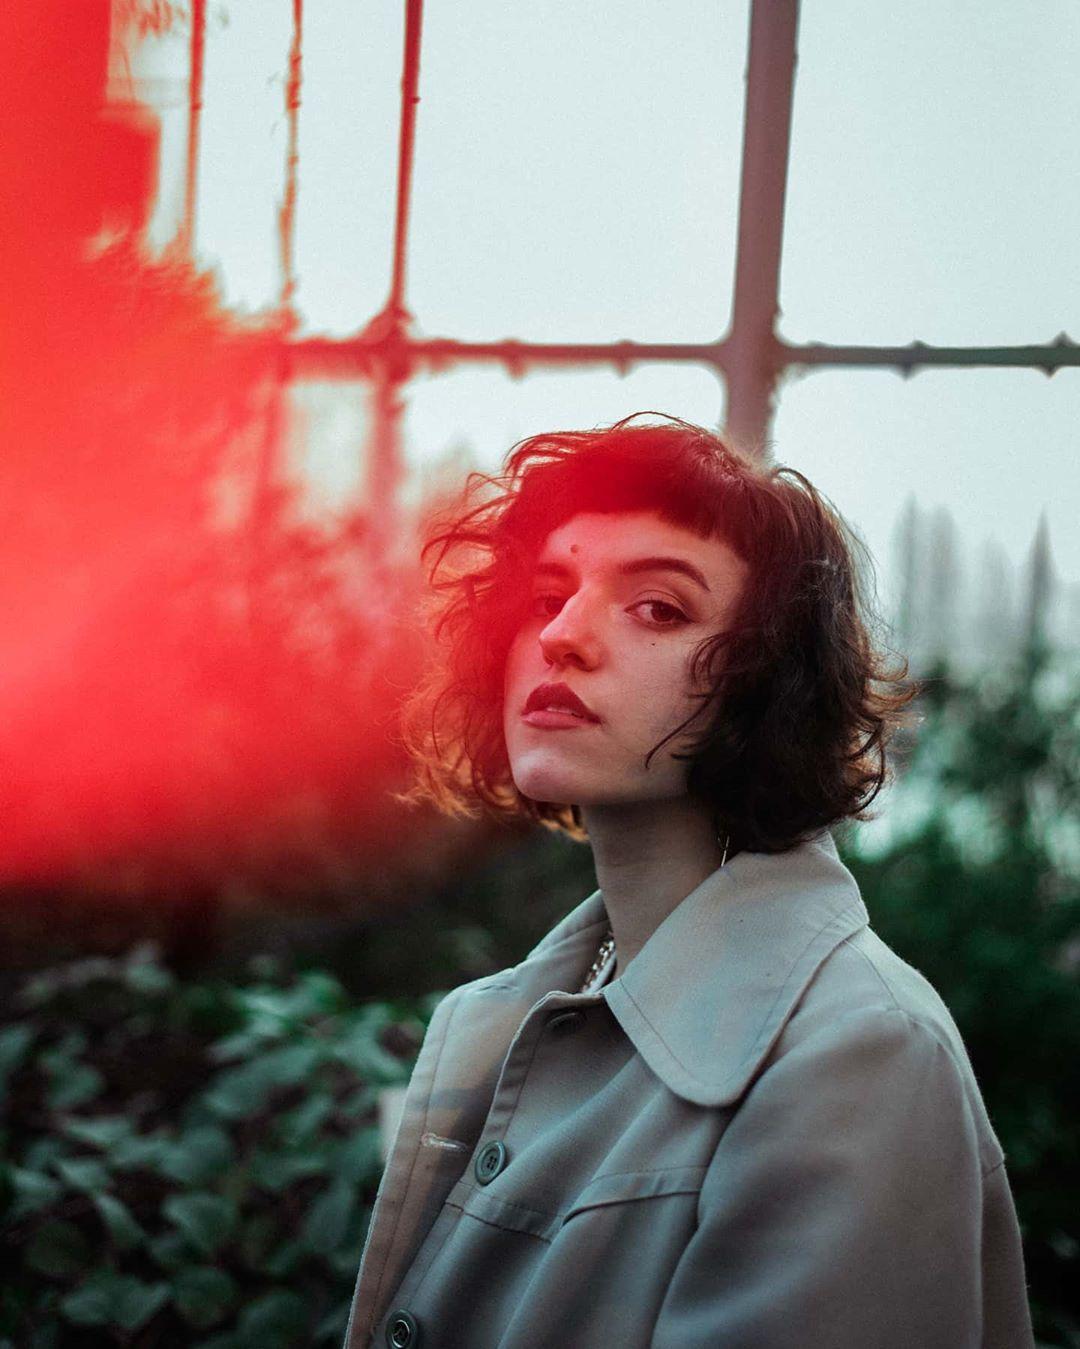 red lights. [Model @lexvitacolada ] ⁰⁴⁹/³⁶⁶ ʷᵉʳᵇᵘⁿᵍ⁻ᵛᵉʳˡⁱⁿᵏᵘⁿᵍ . . . . . _________ #portrait #pulsefilm #portrait_vision #fotoart #777luckyfish #berlinmodel #naturelight #portrait_today #globe_people #farbwolke #shootfilmunder1000 #forevermagazine #dreamermagazine #mitherzundlicht #folkfilm  #instakwer #forestphotography #berlin #human_art #availablelight #femalephotographer #of2humans #fatedmagazine